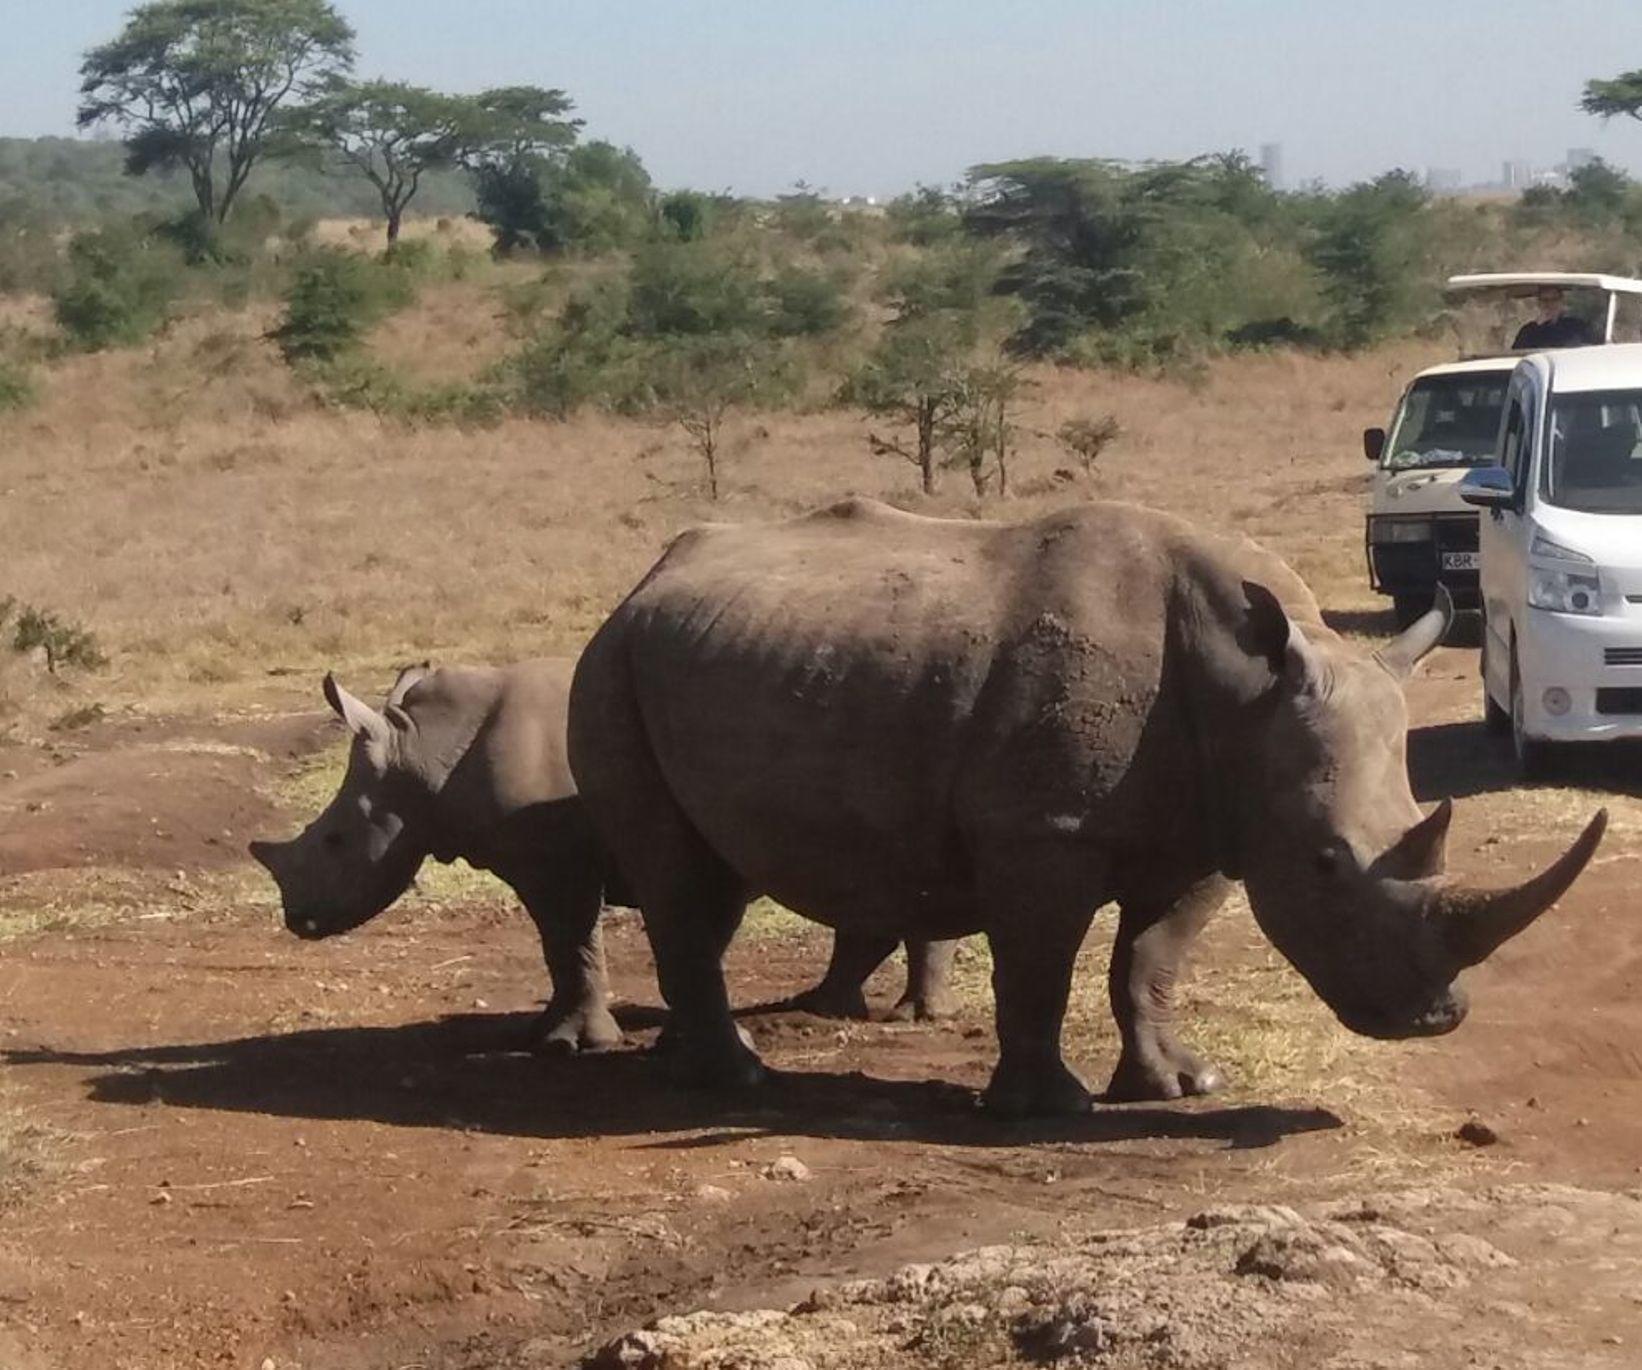 Rhino seen on the Full Day Nairobi National Park tour